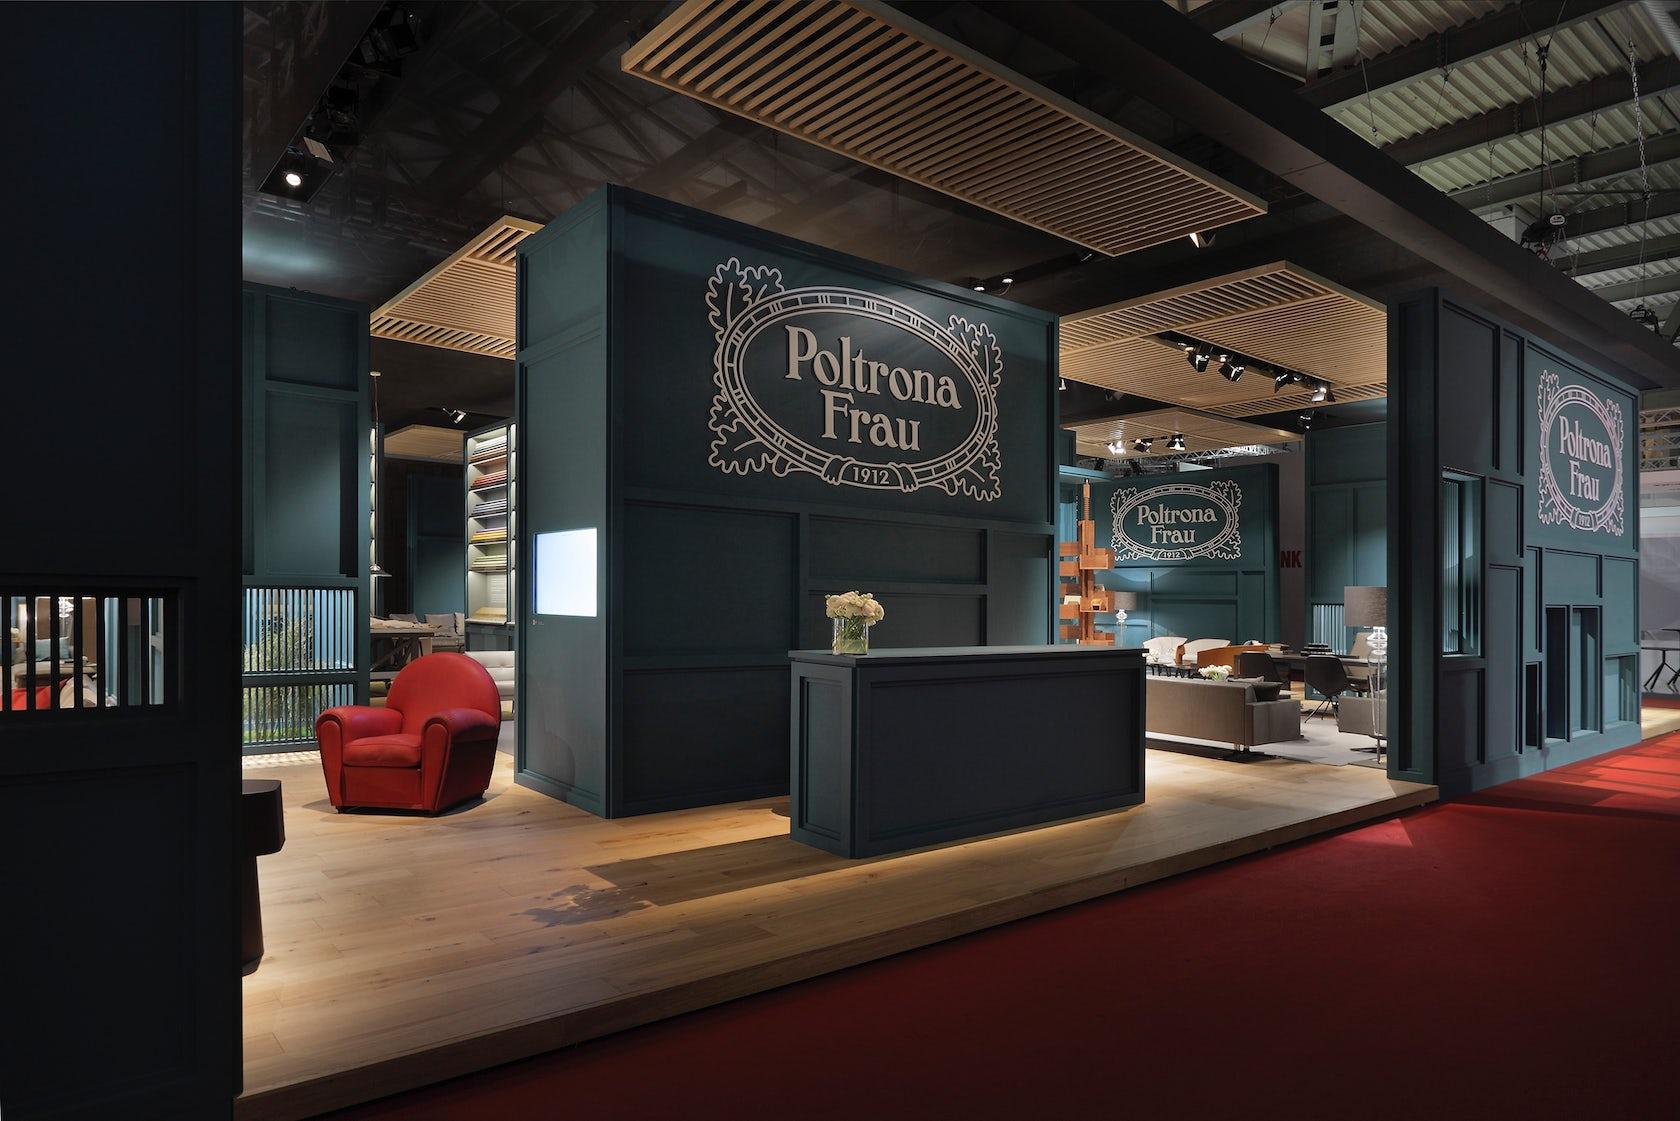 Poltrona frau stand 2014 architizer for Poltrone frau milano